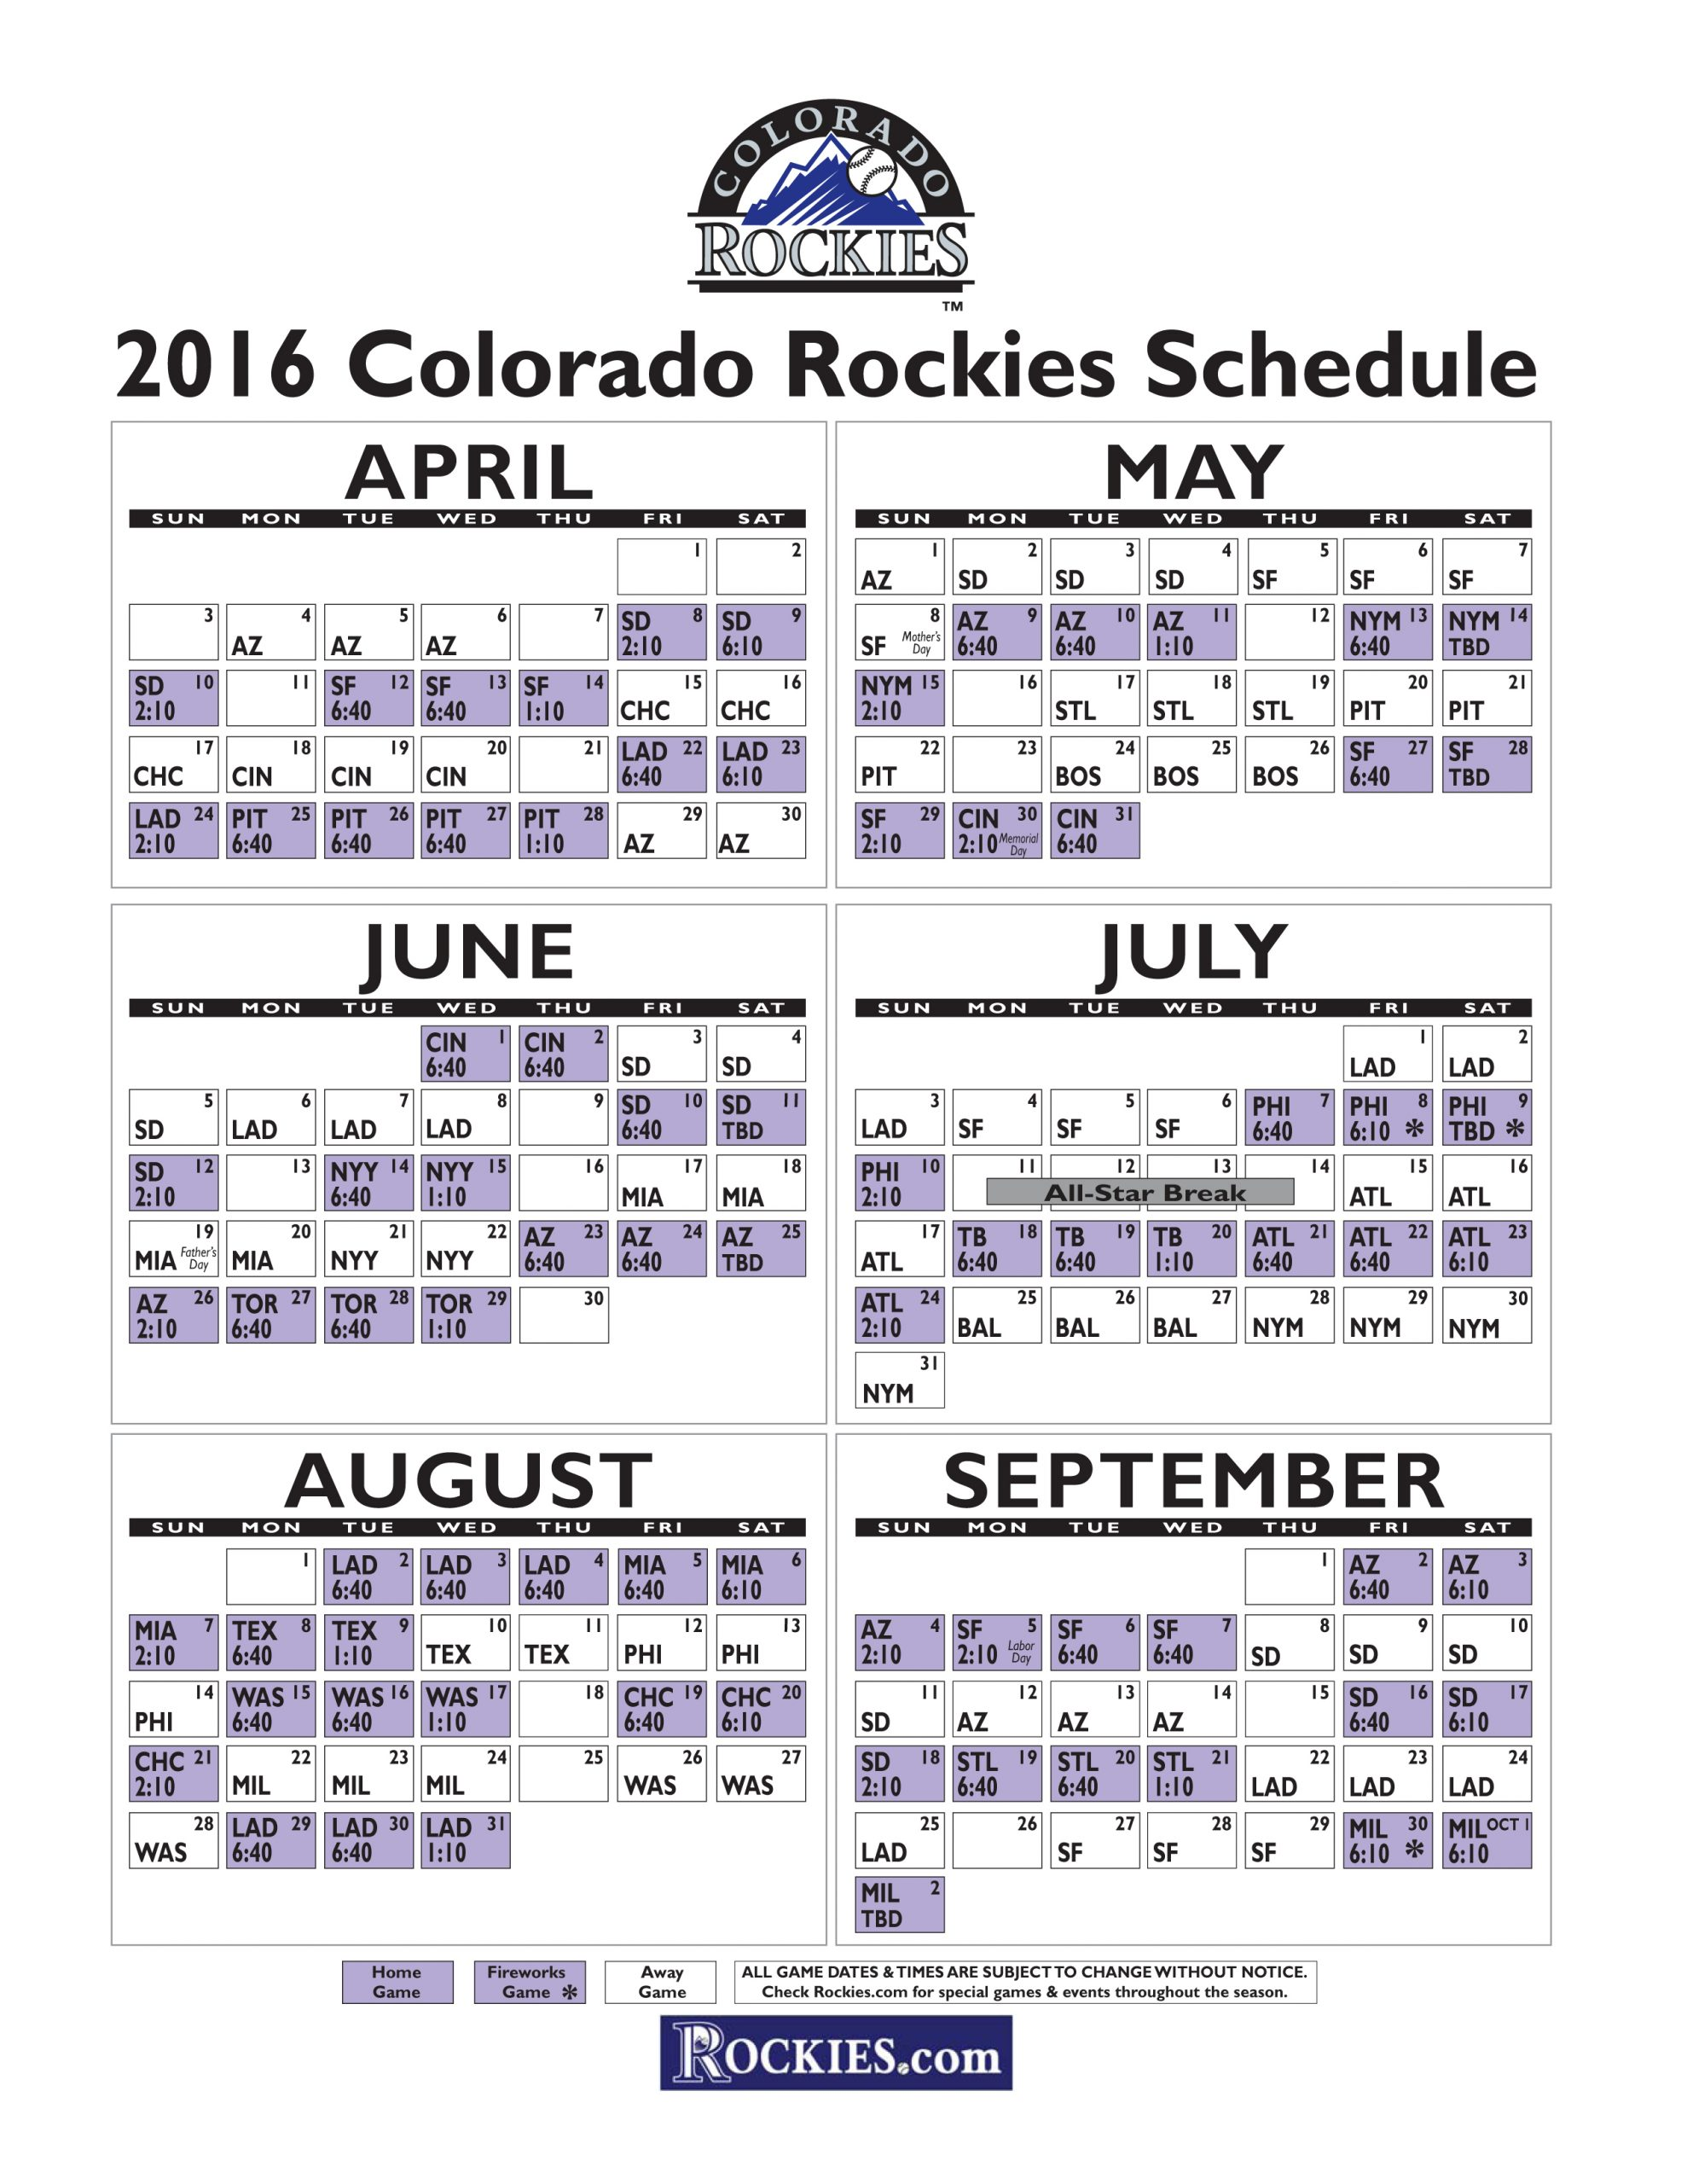 Colorado Rockies Schedule 2015 Examples And Forms